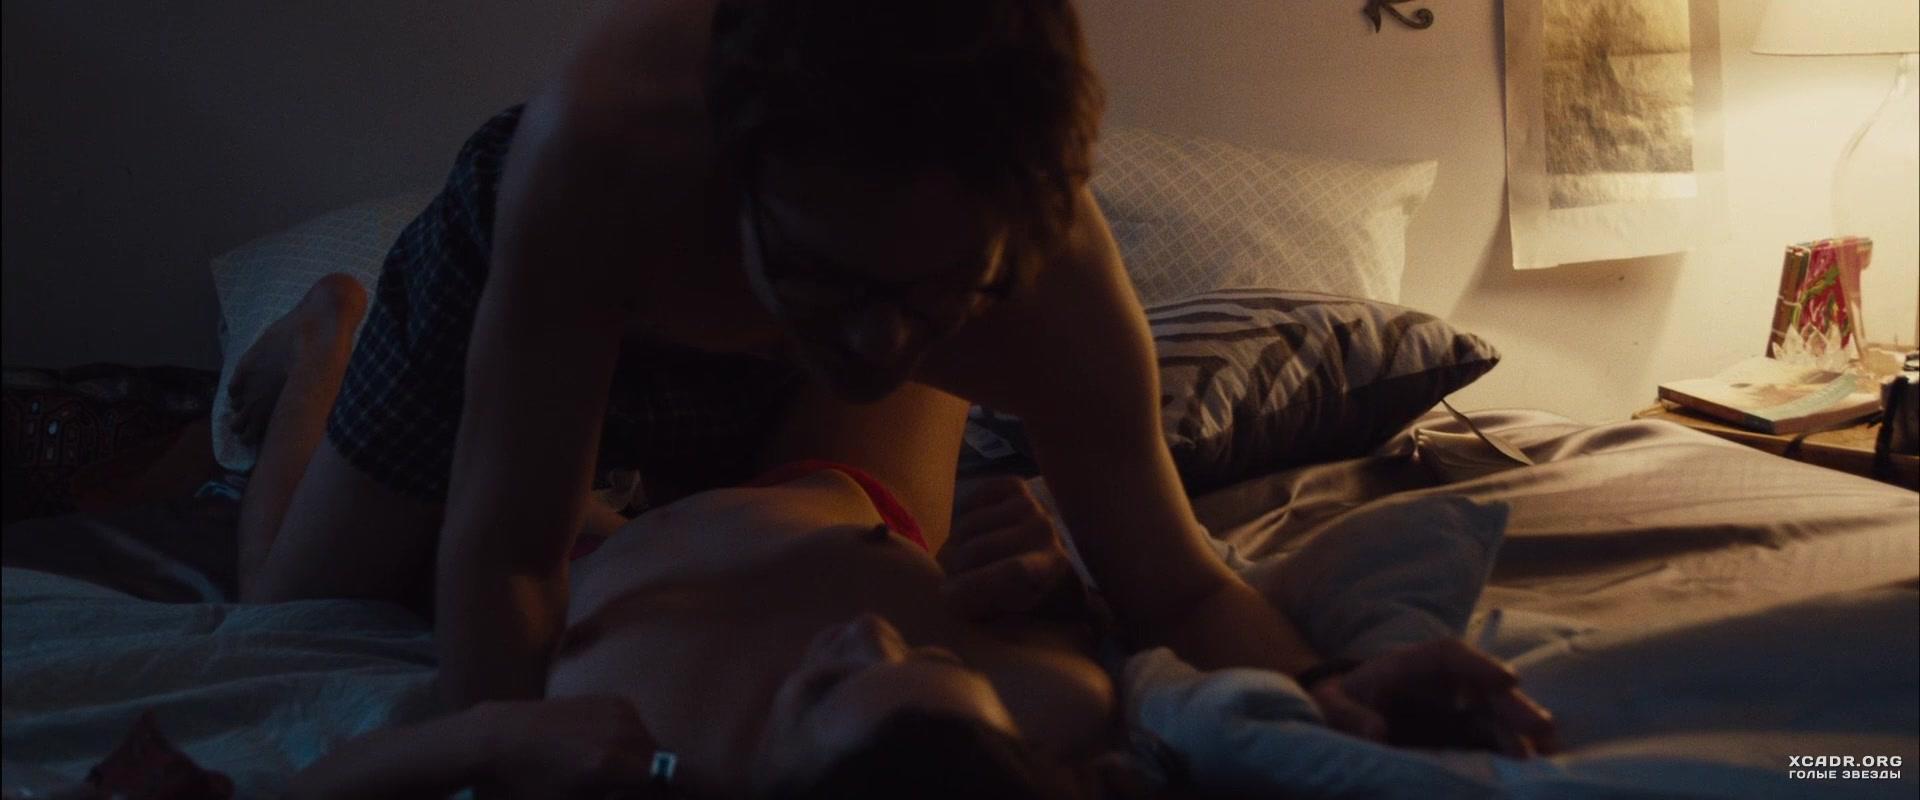 Астрид берже фрисби сцены секса